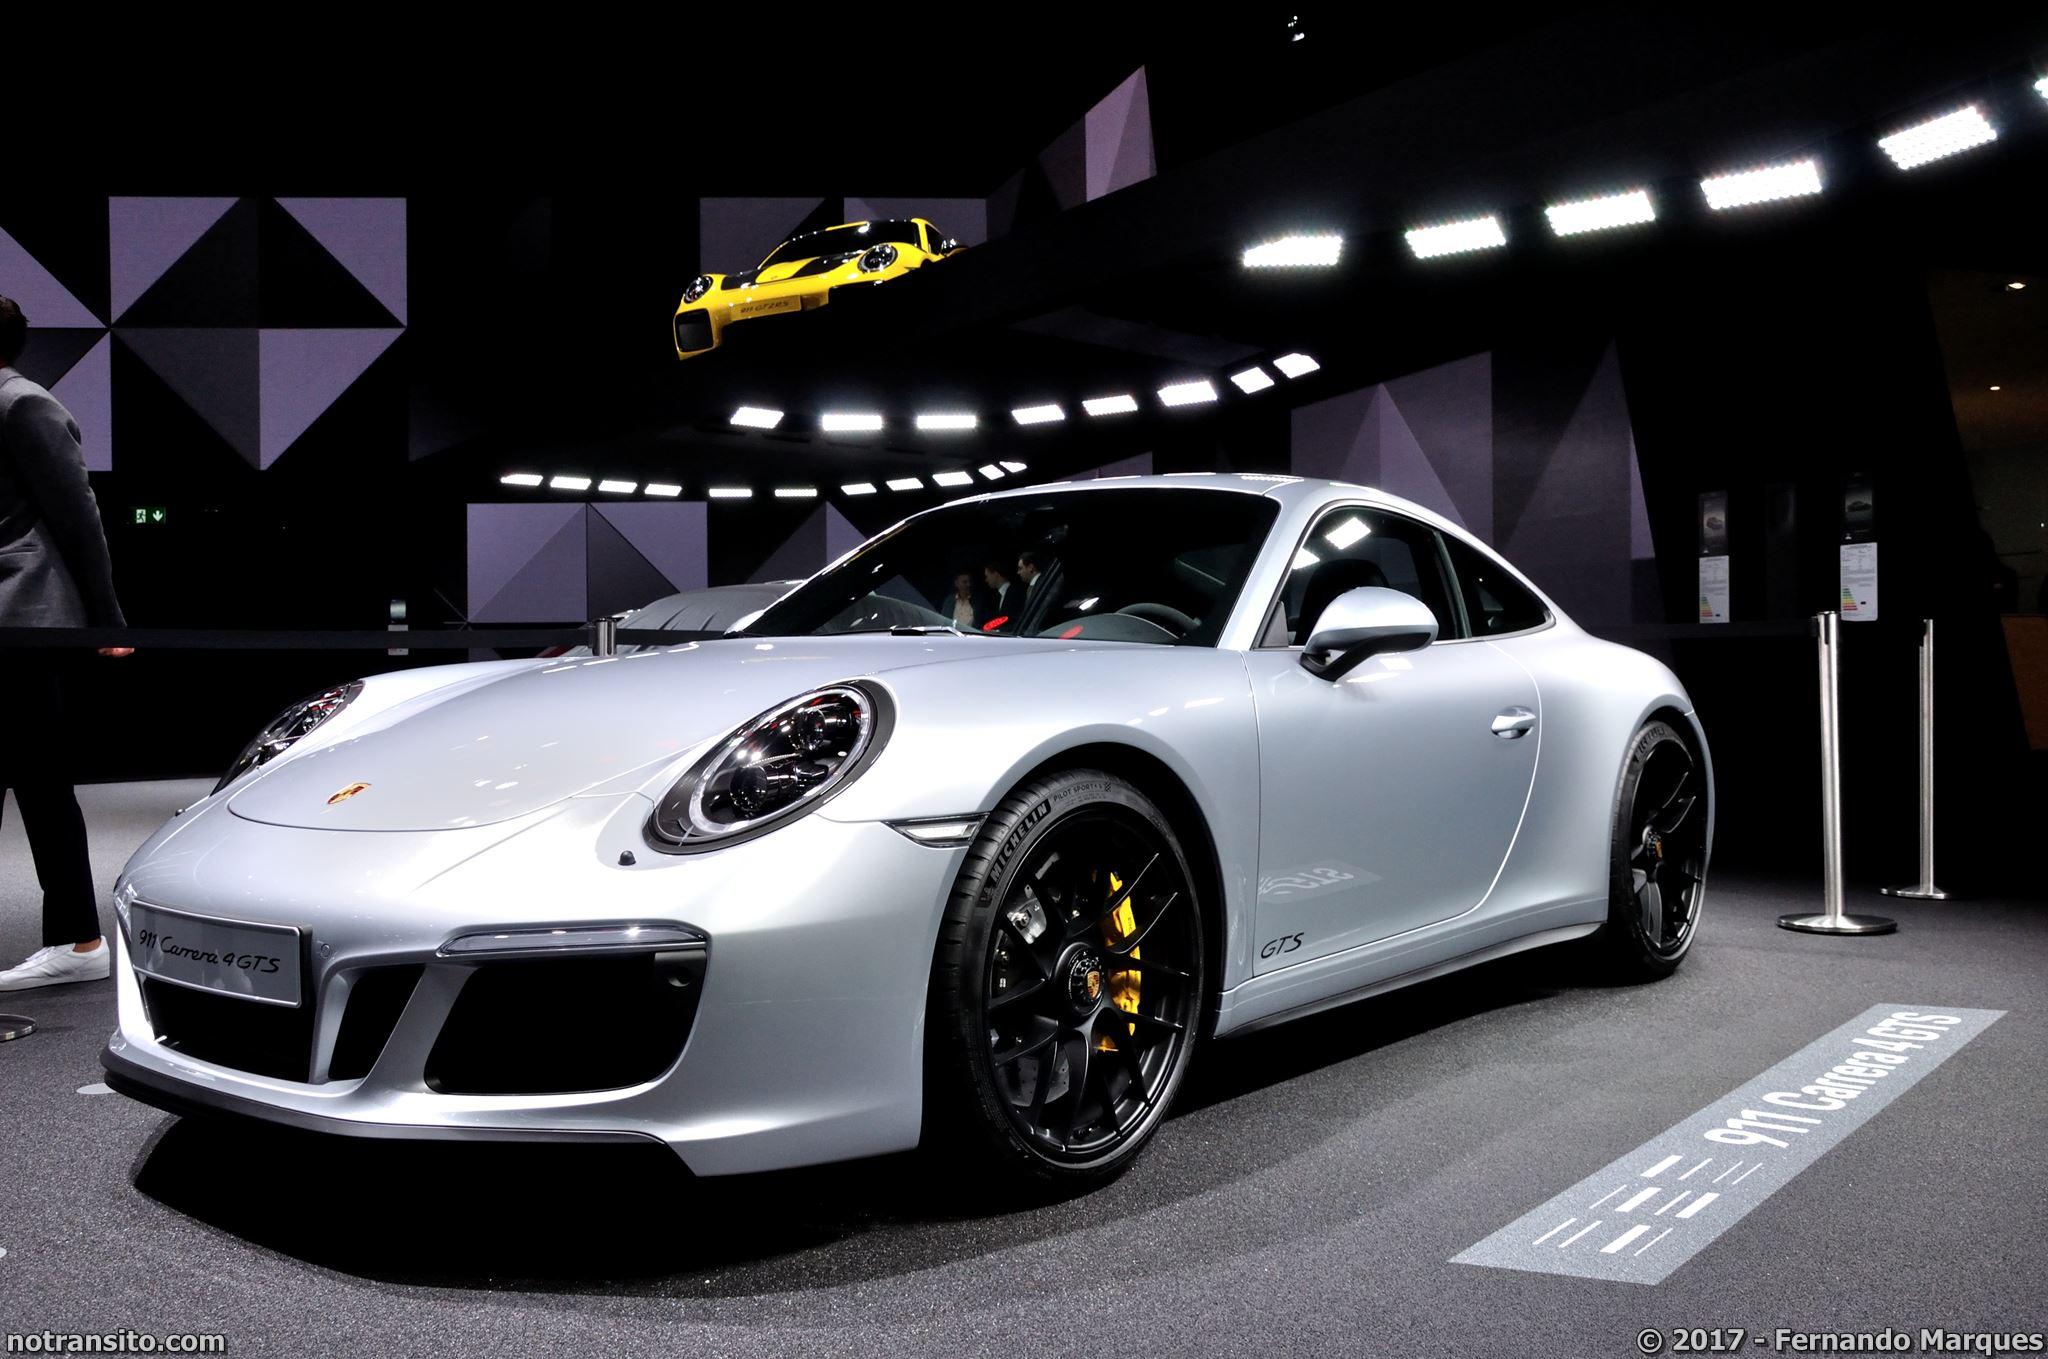 Porsche-911-Carrera-4-GTS-Frankfurt-2017-003